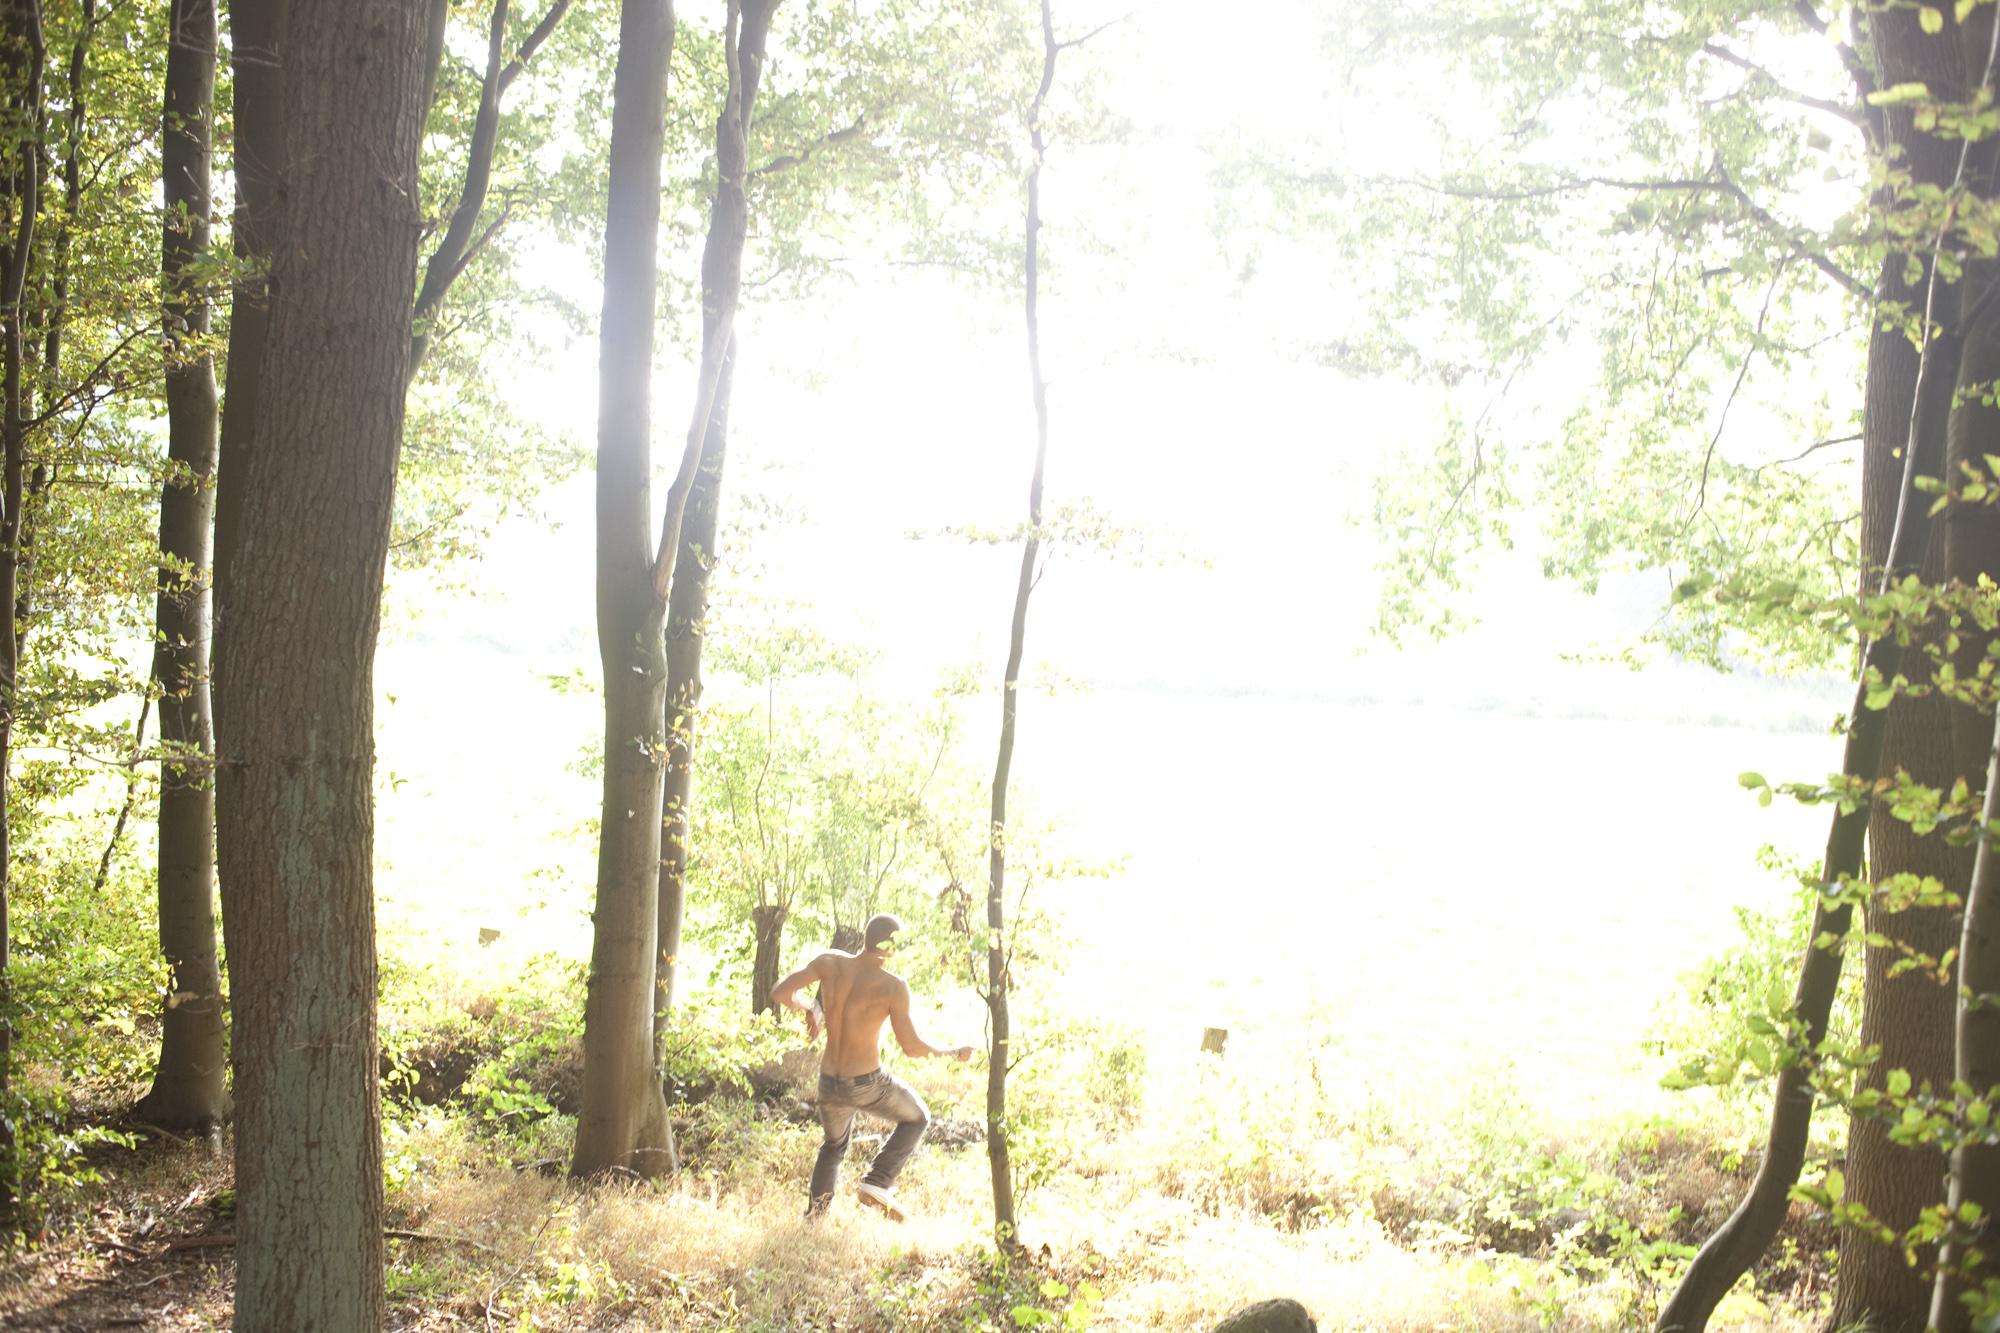 Daniel_van_Flymen_FOREST_002.jpg